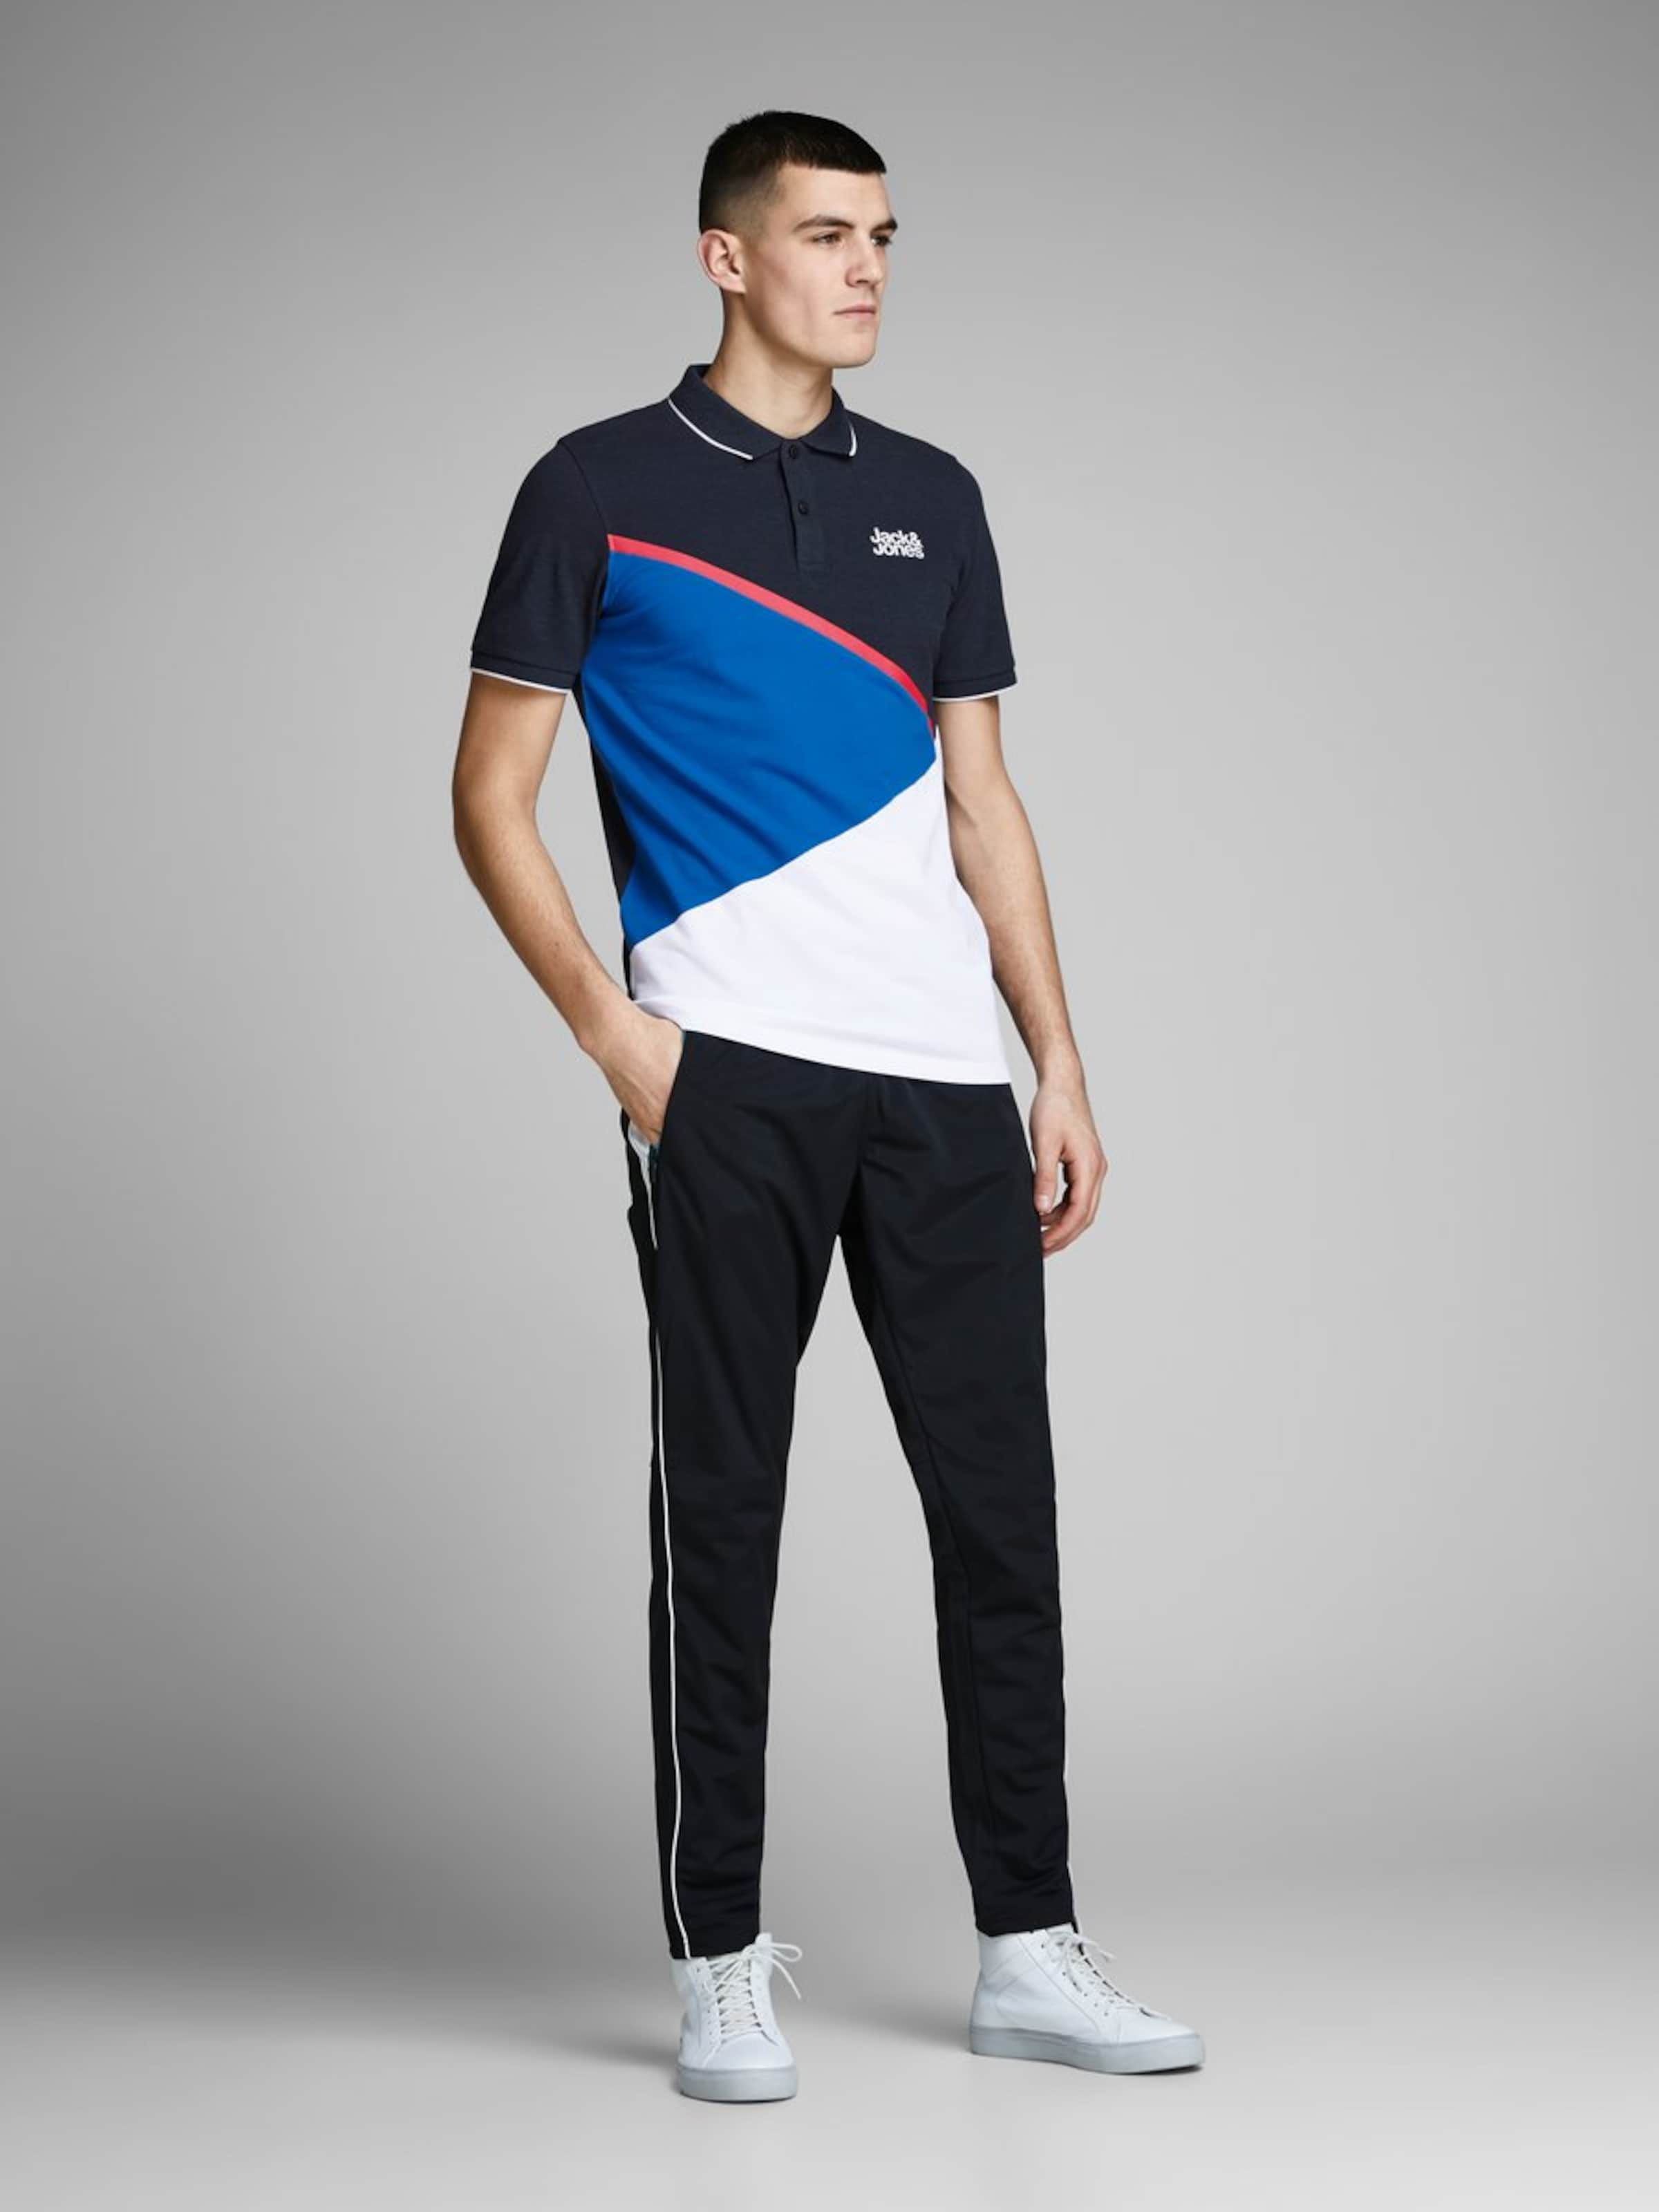 Jackamp; T shirt Blanc En BleuNuit Jones ALq4j35R